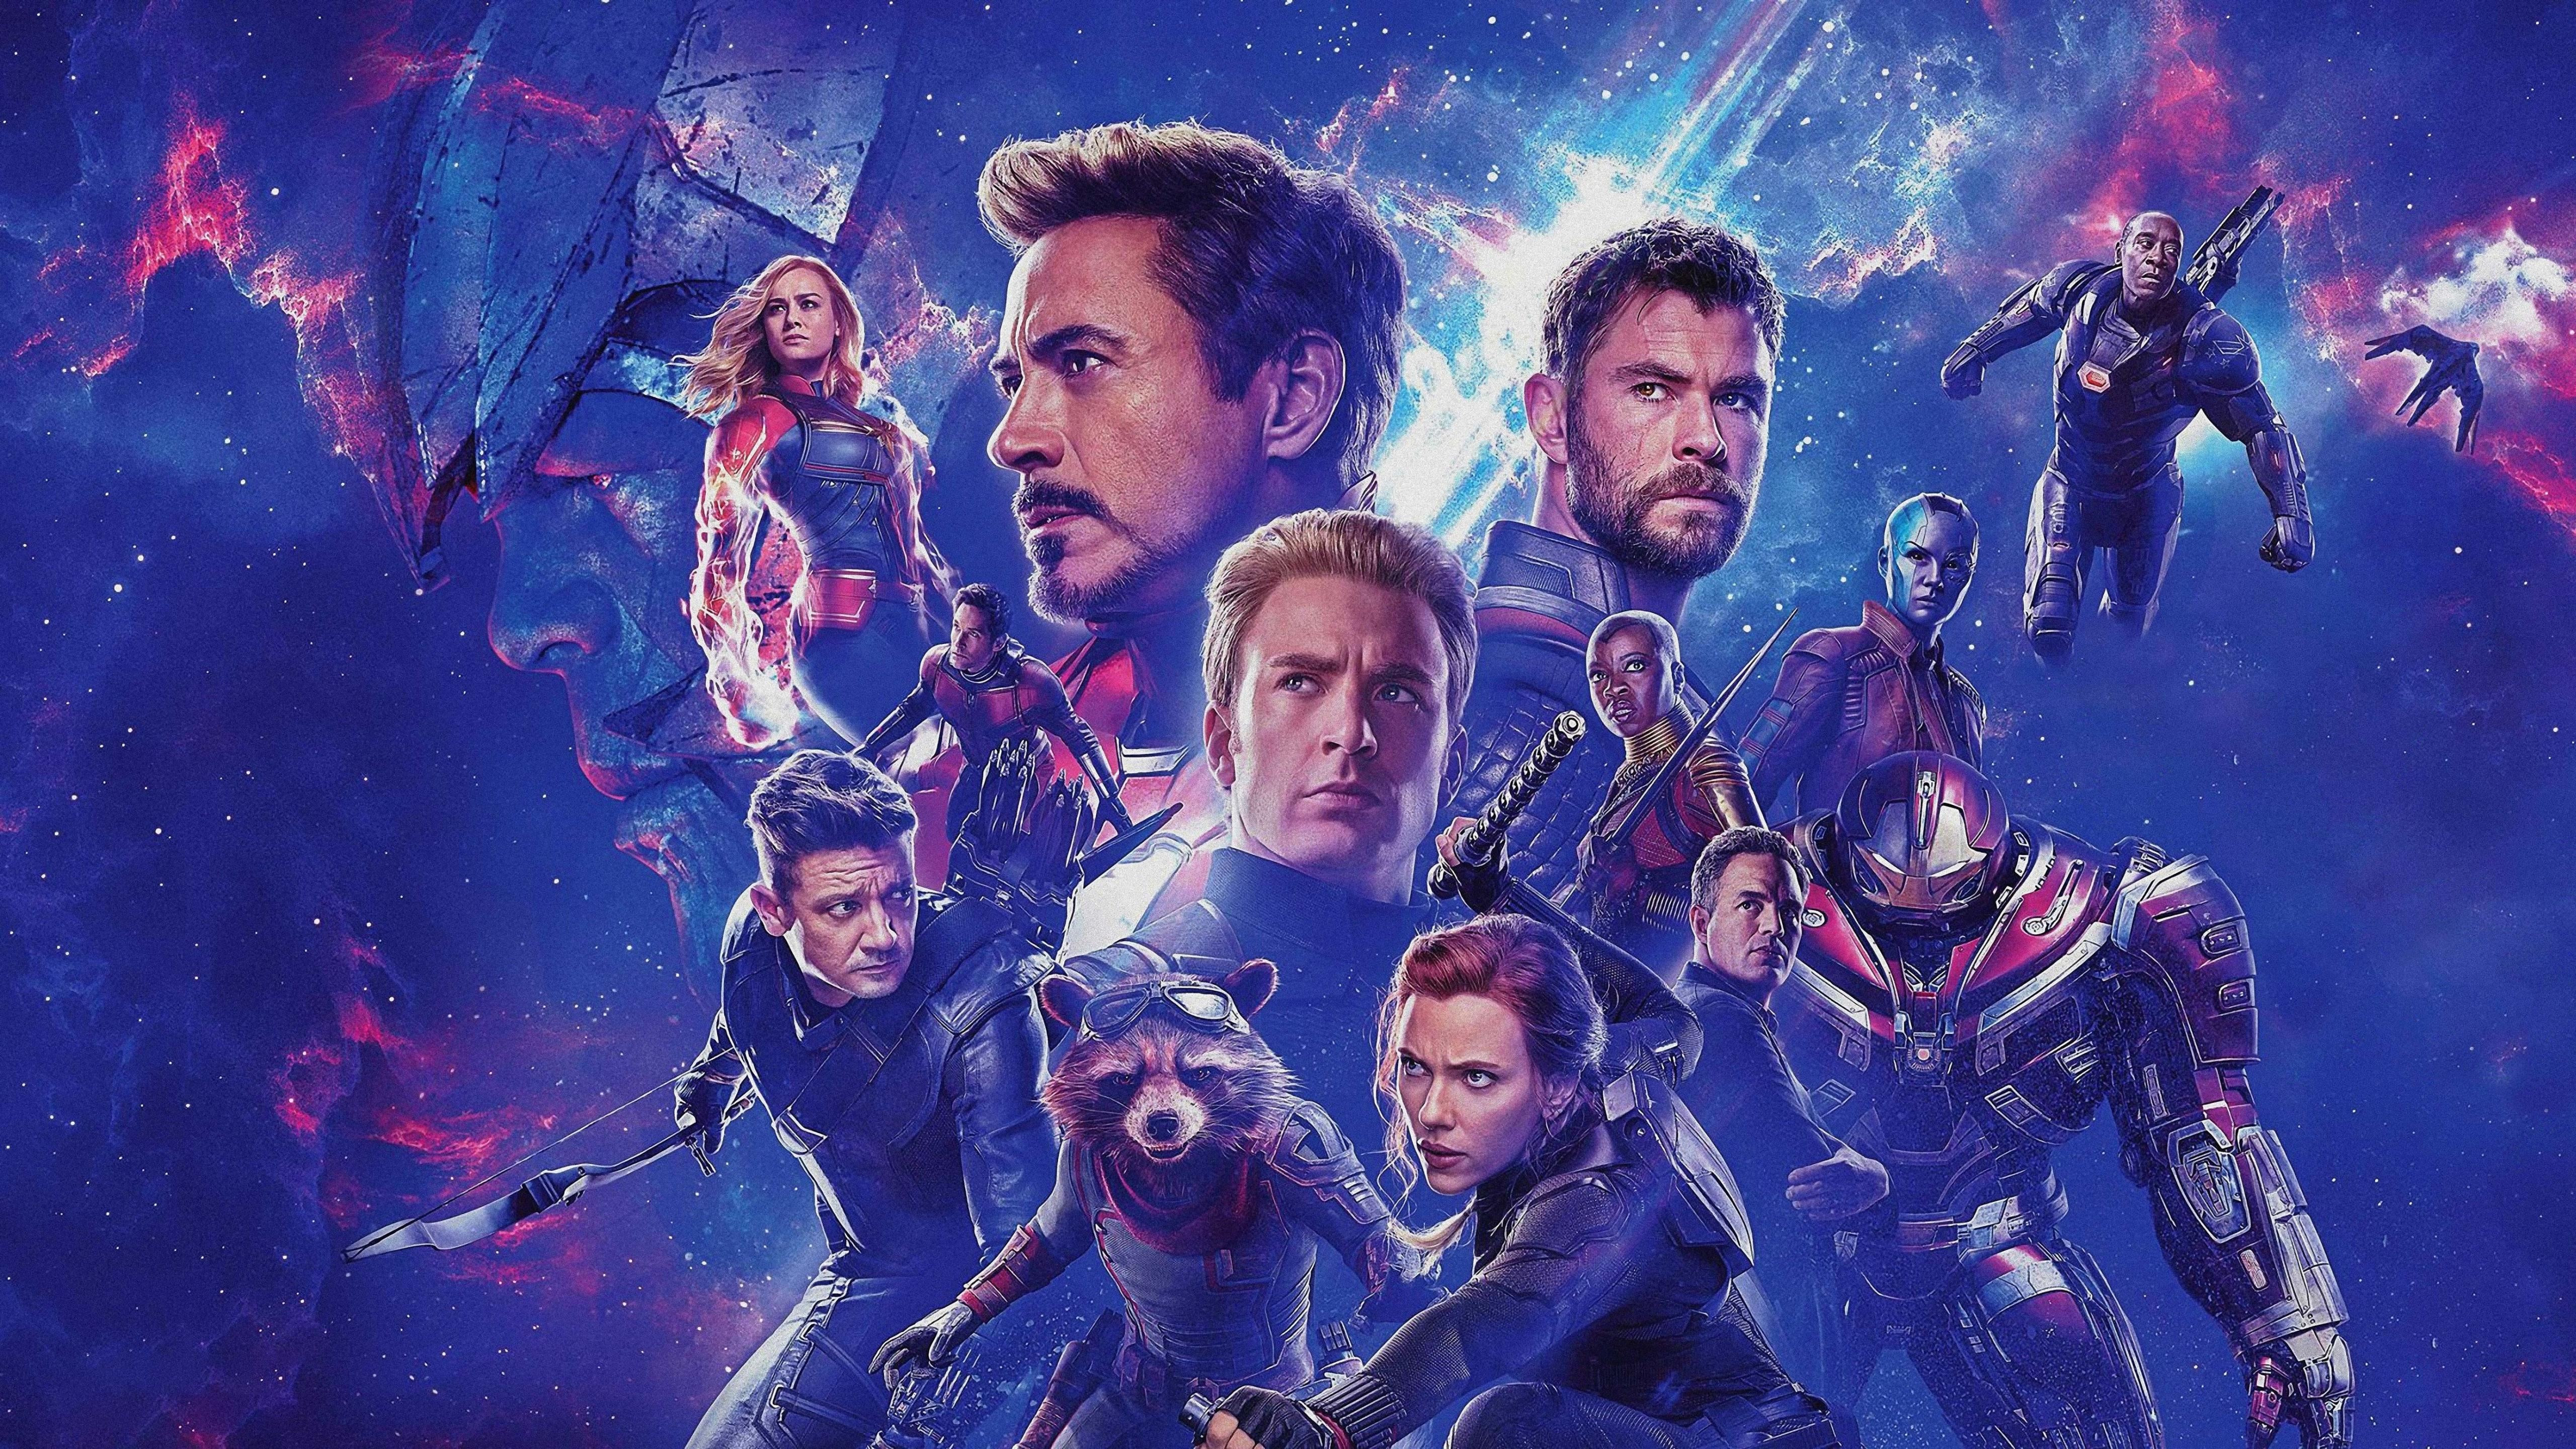 5120x2880 8K Avengers Endgame 5K Background, HD Movies 4K ...